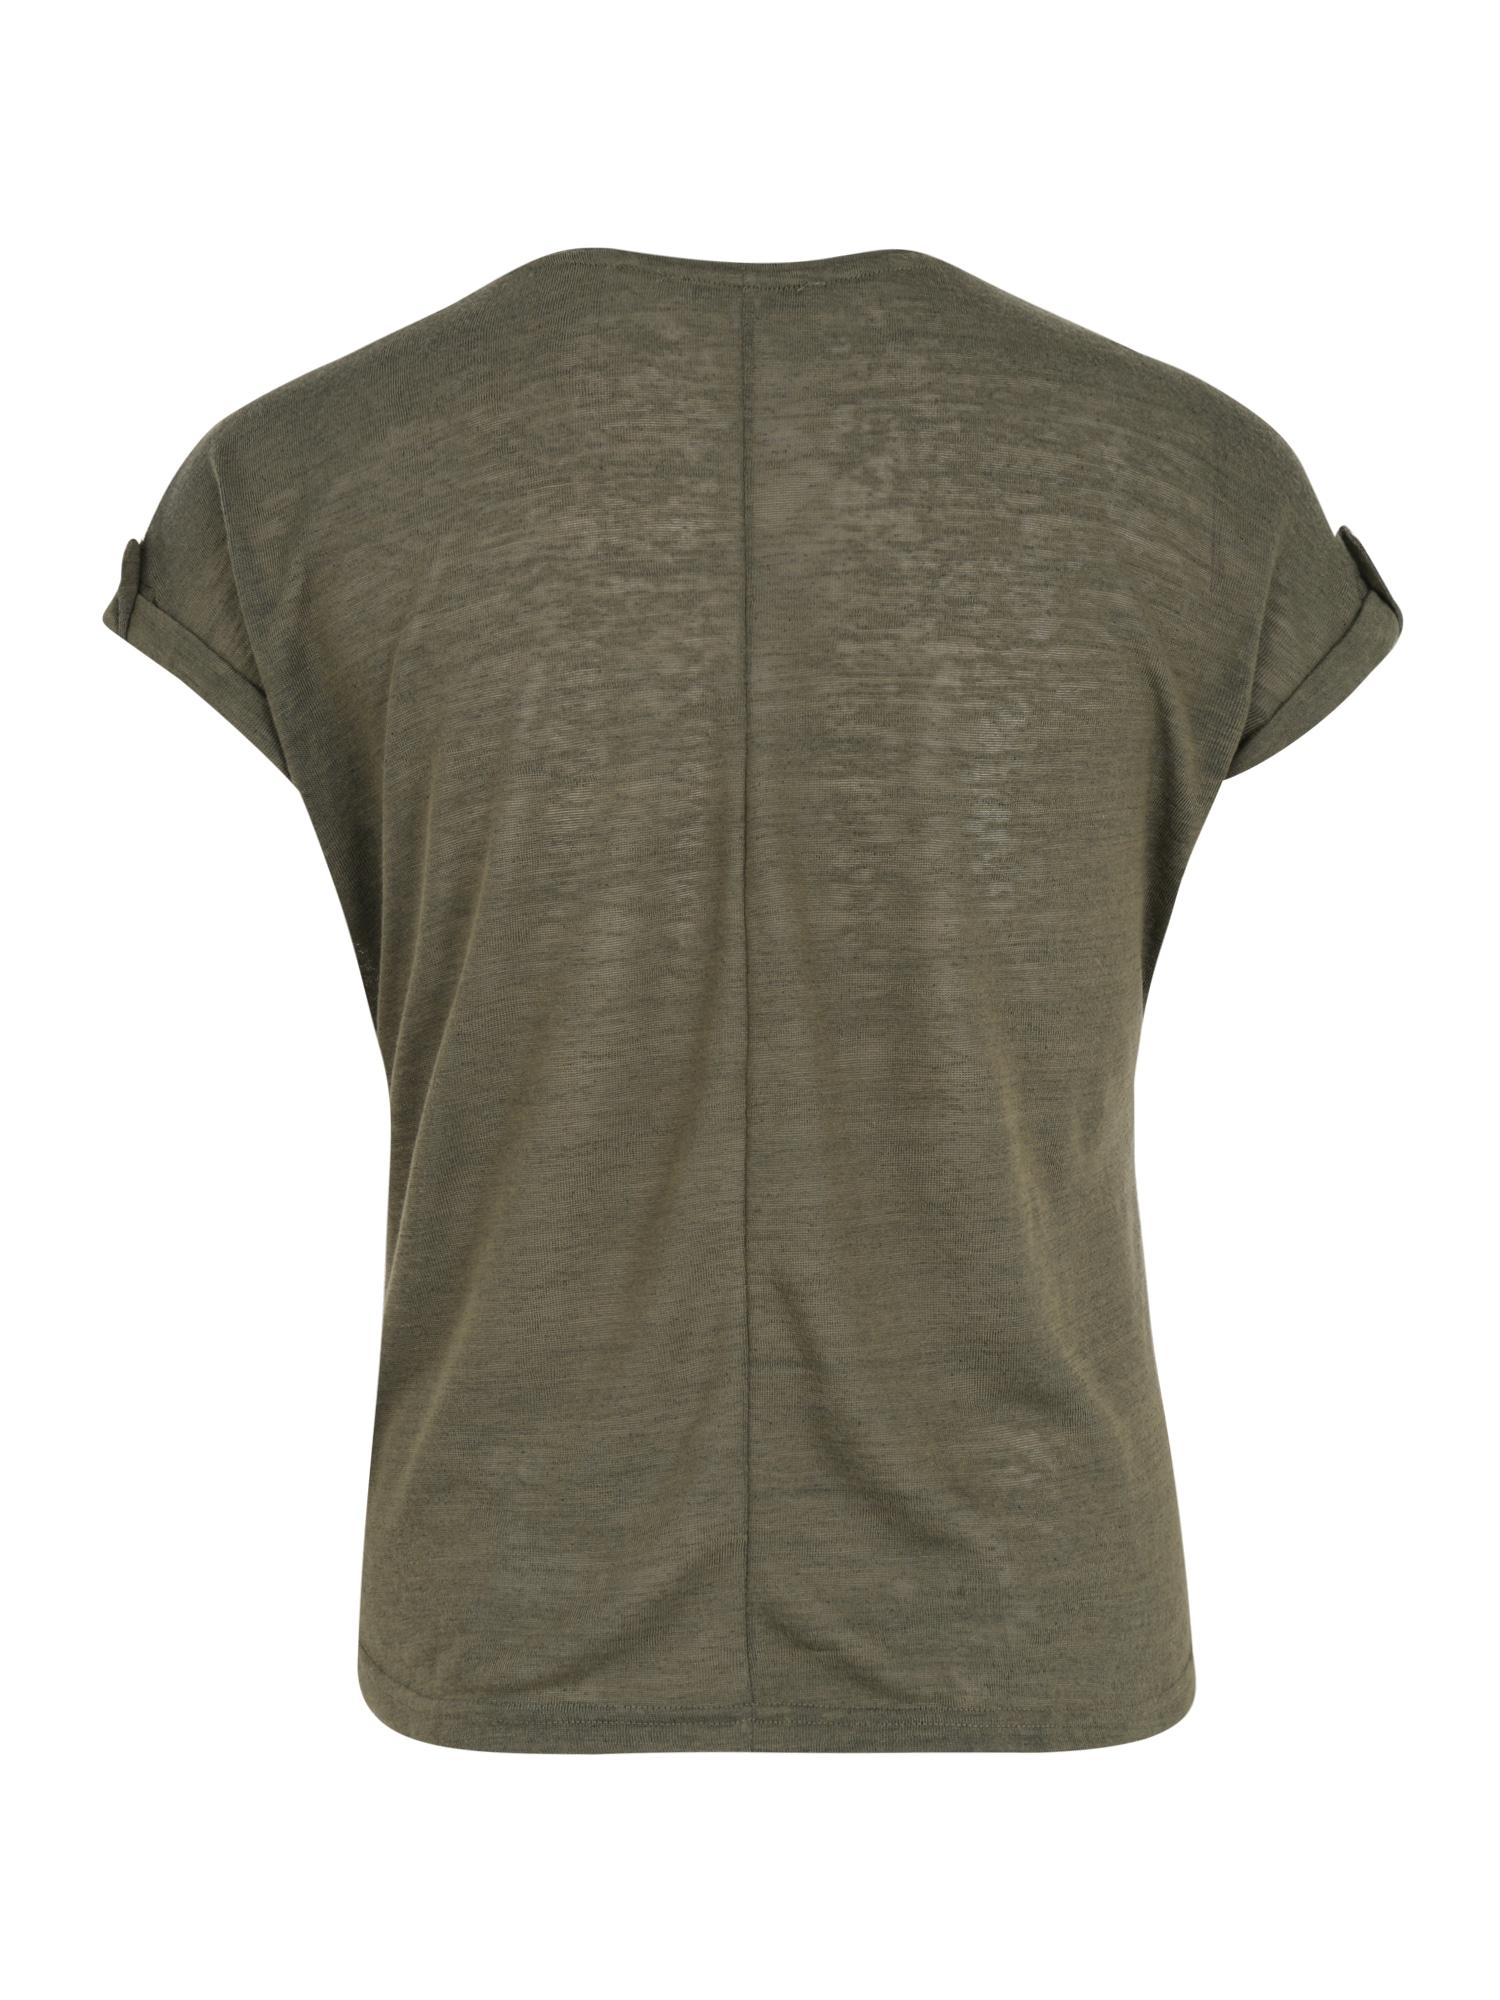 ABOUT YOU Curvy T-shirt 'Kaili Shirt'  grön / khaki / mörkgrön